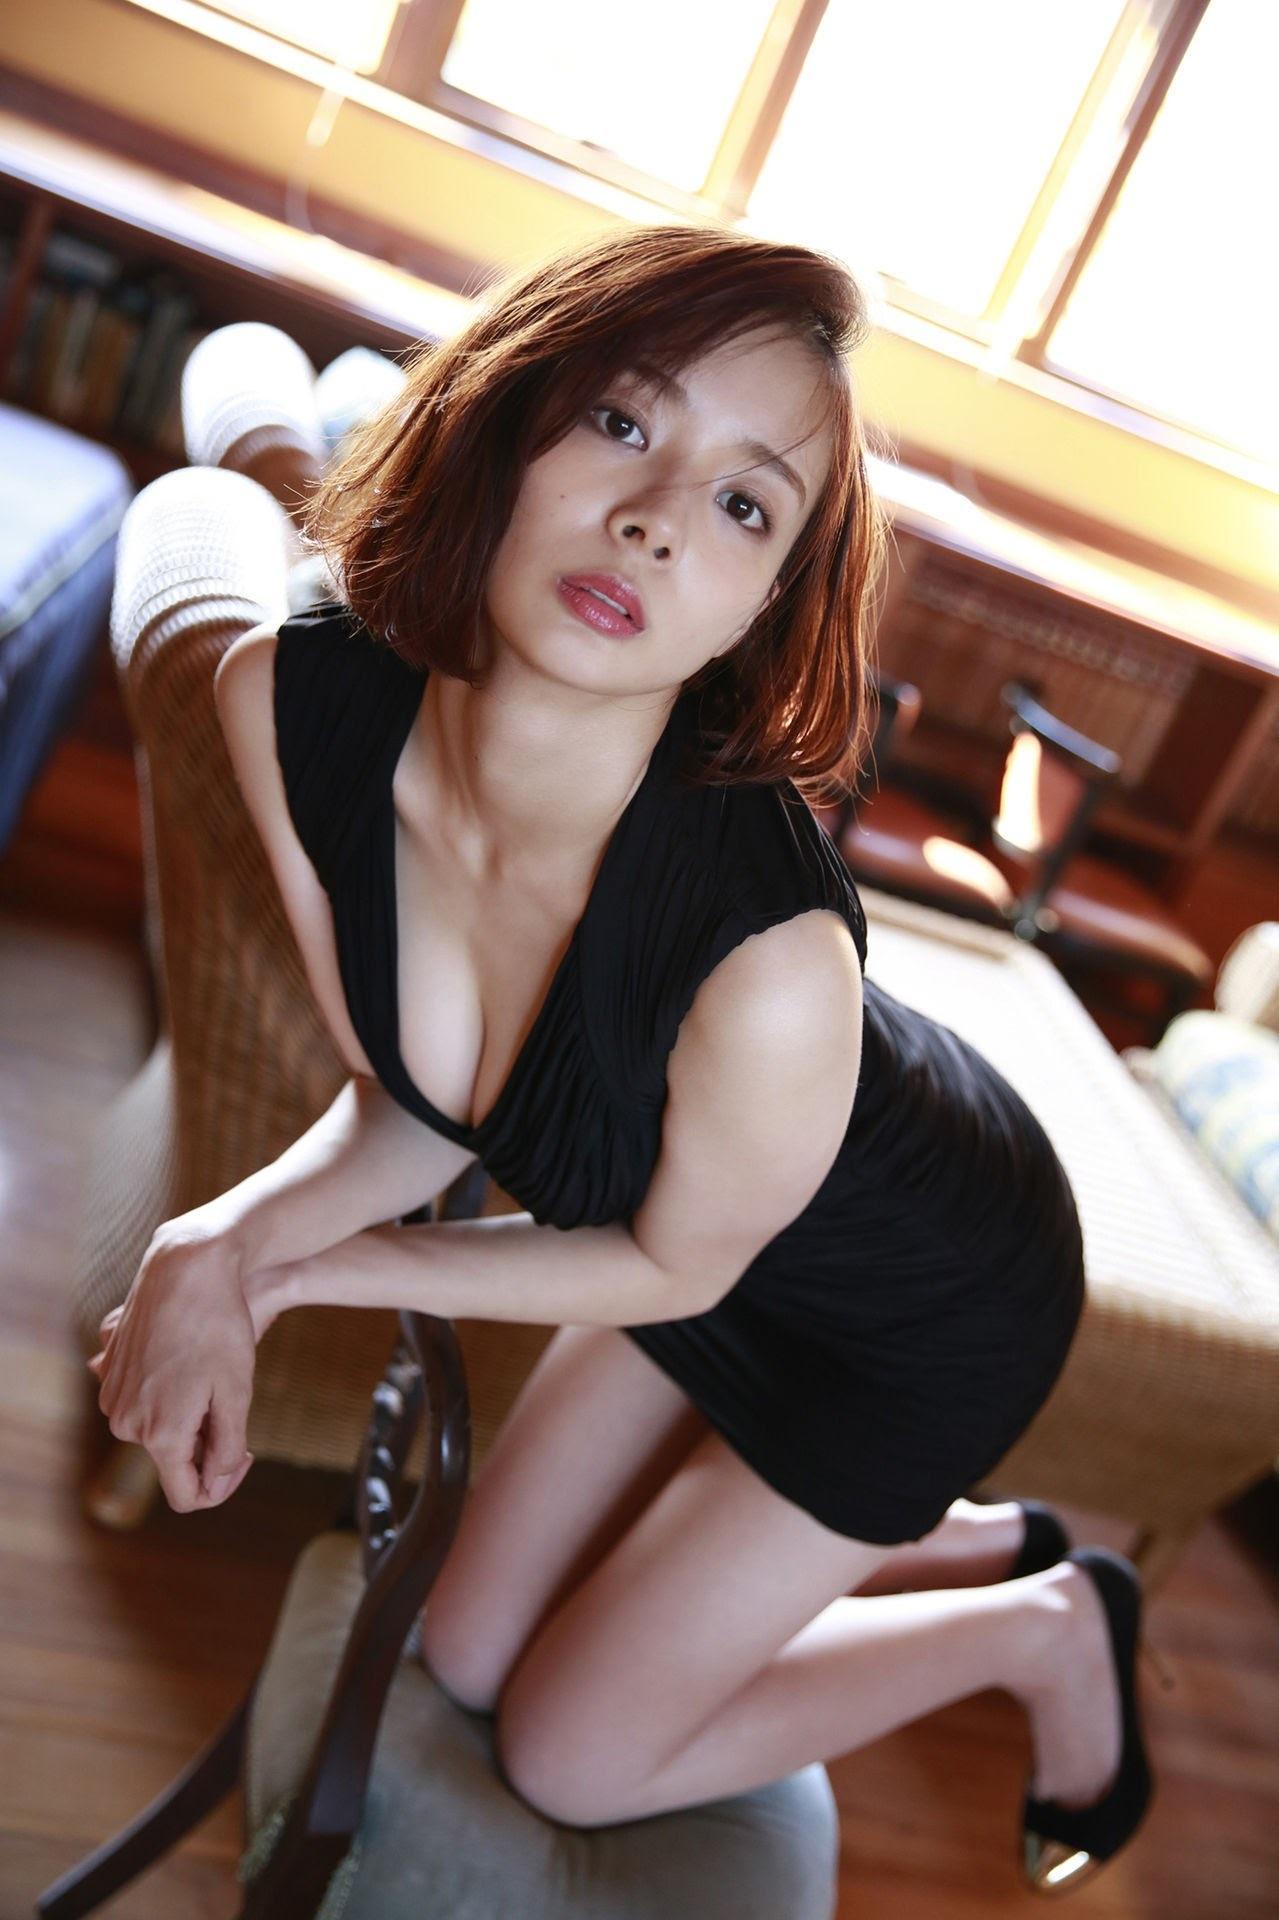 23 years old Shaka Okada, who is also a professional mahjong player052